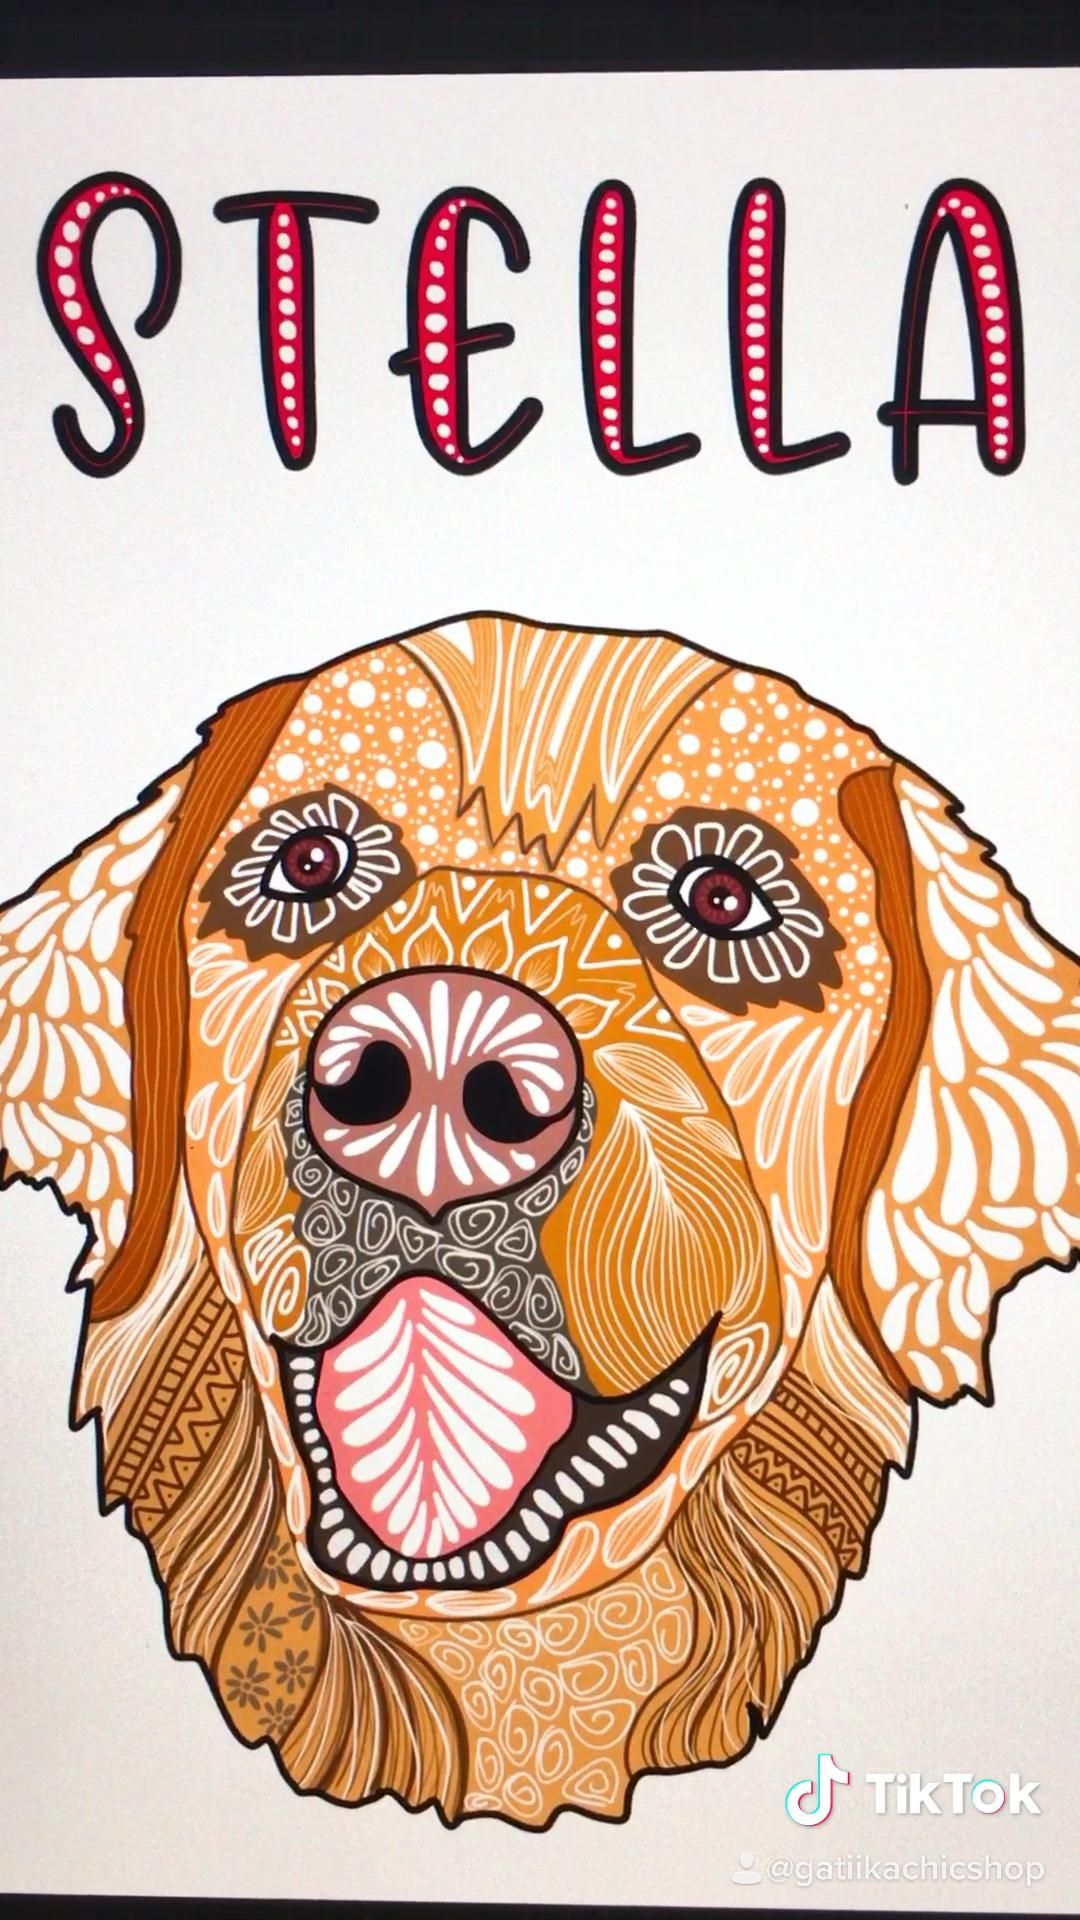 #custompetportrait #art #dogs #dogsofinstagram #tiktokart